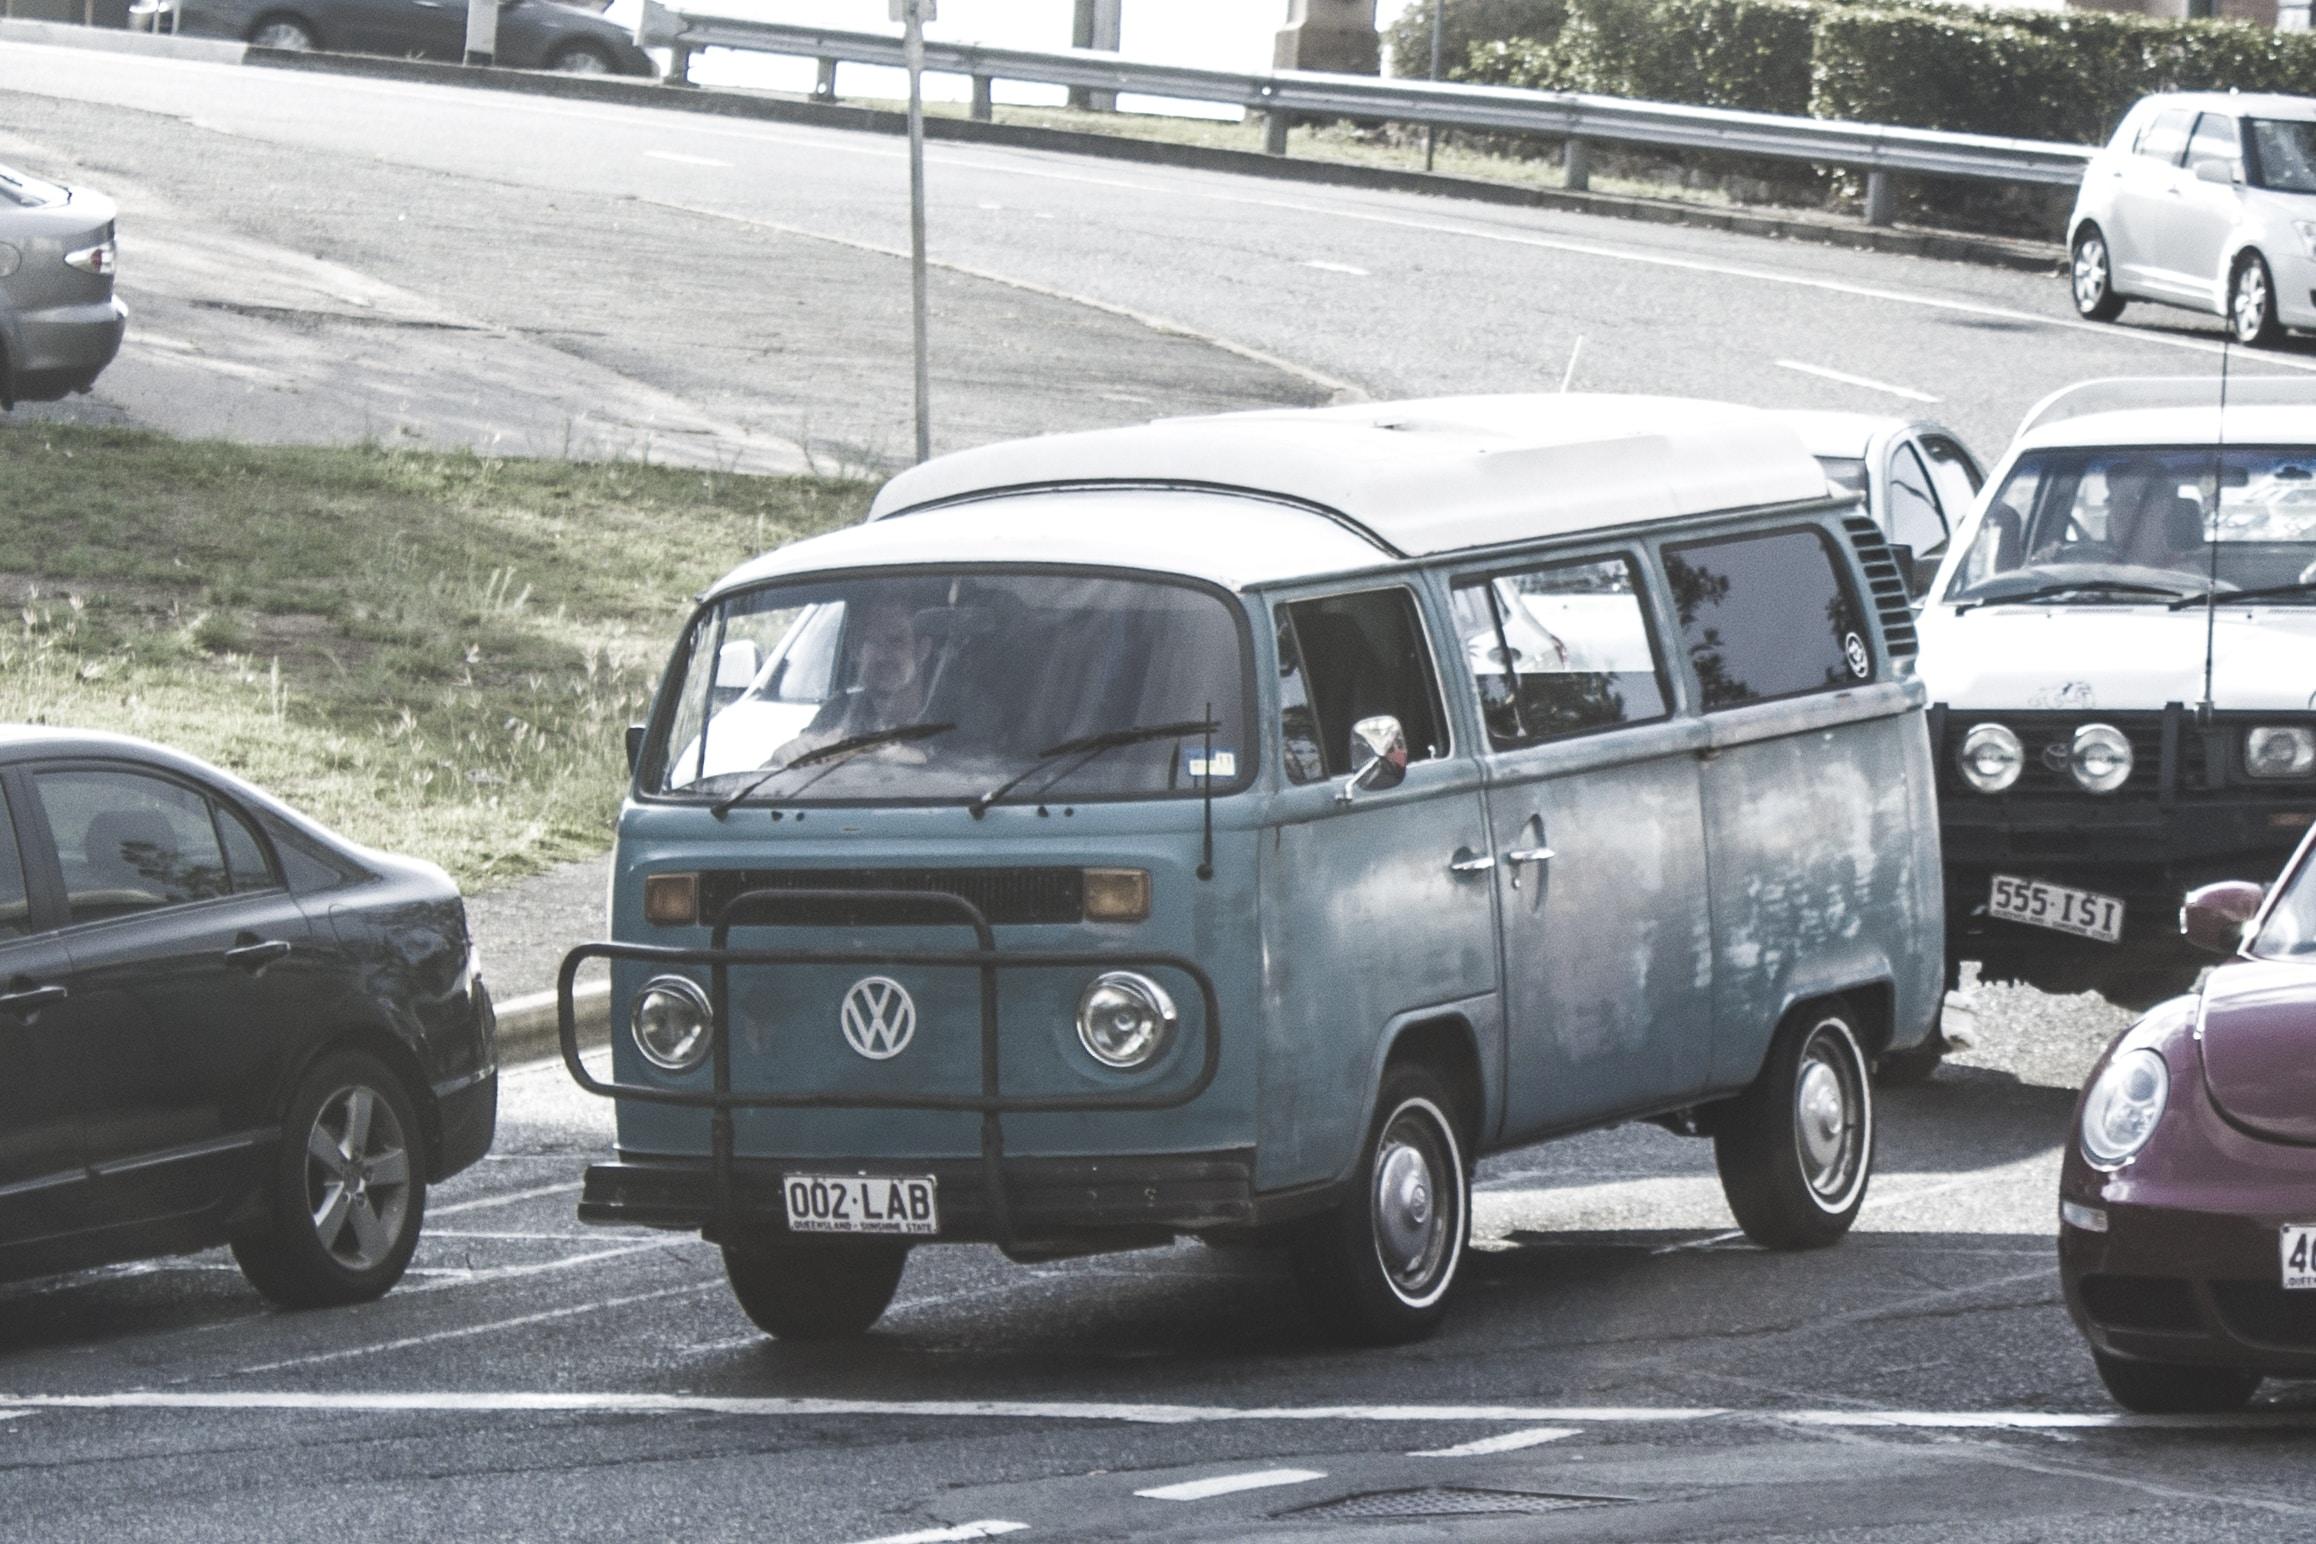 Vintage green Volkswagen camper driving in daytime traffic on road